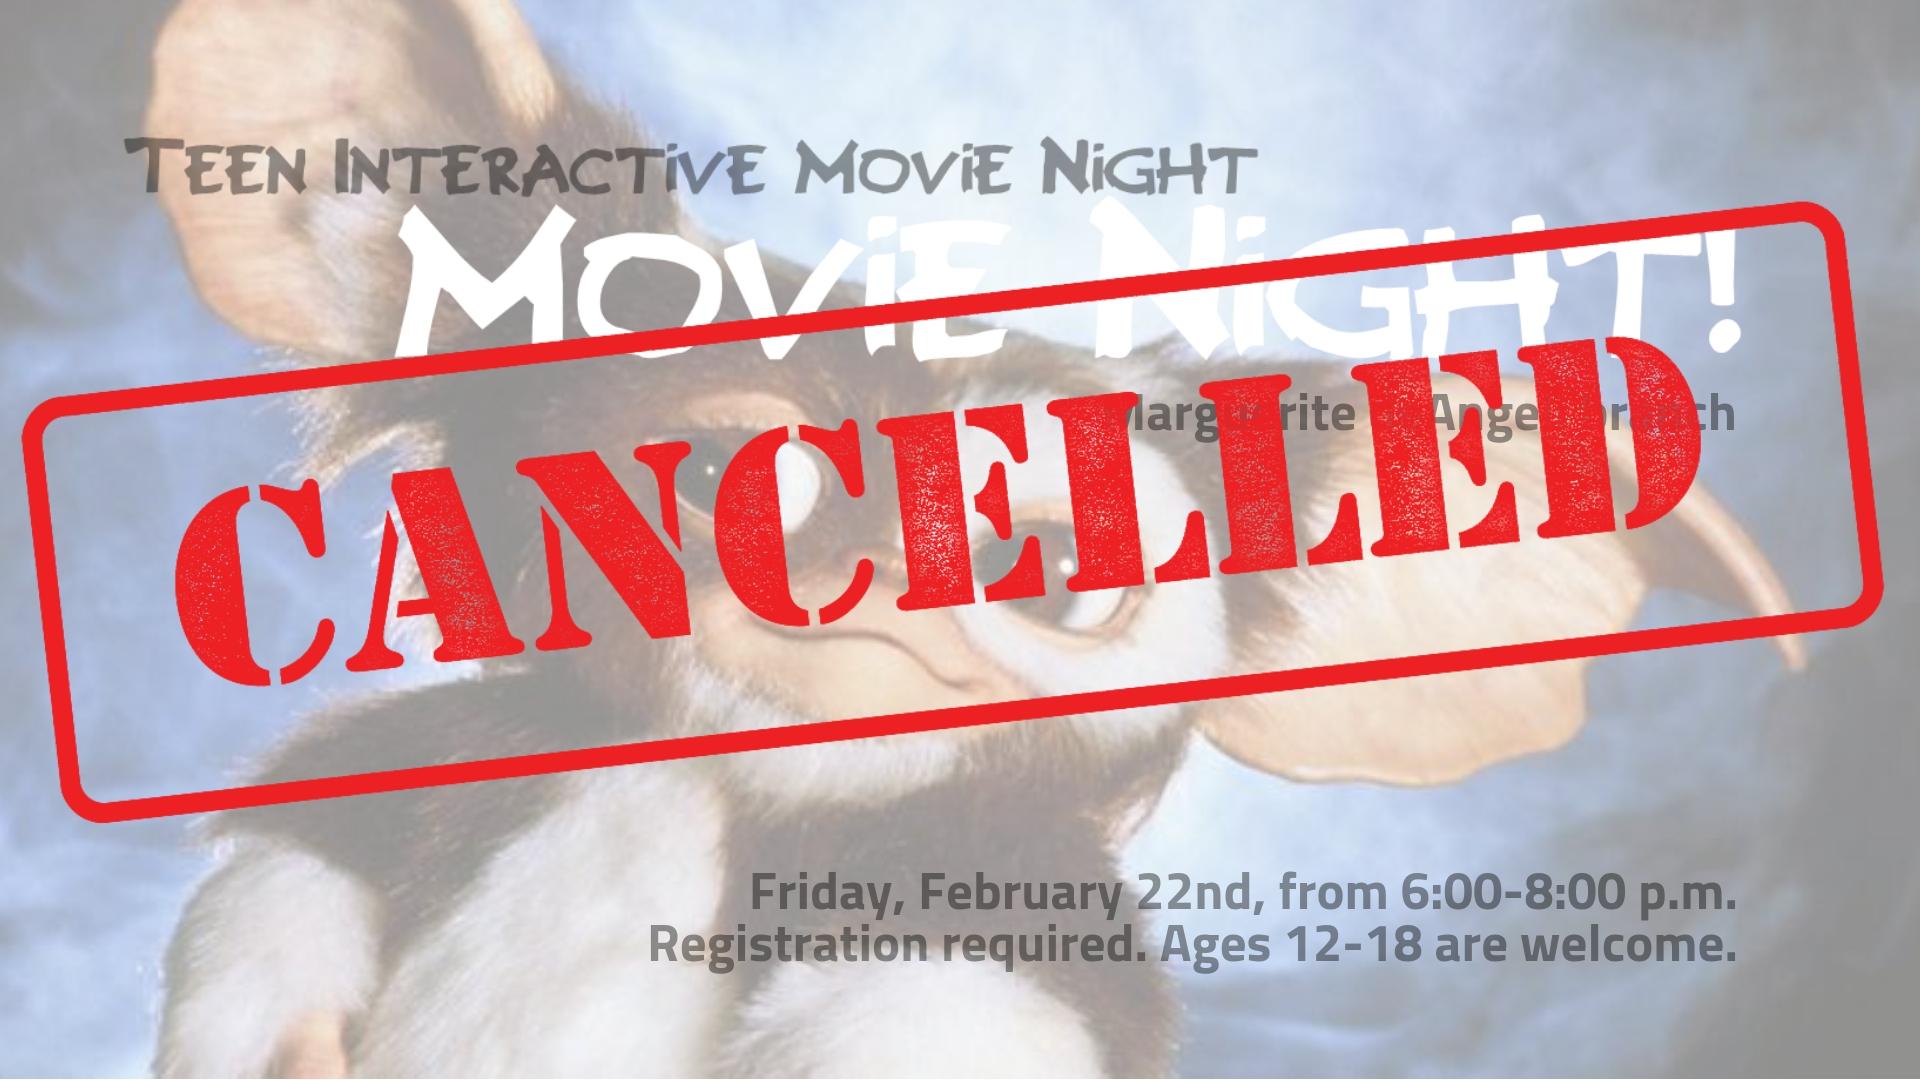 CANCELLED - Teen Movie Night!